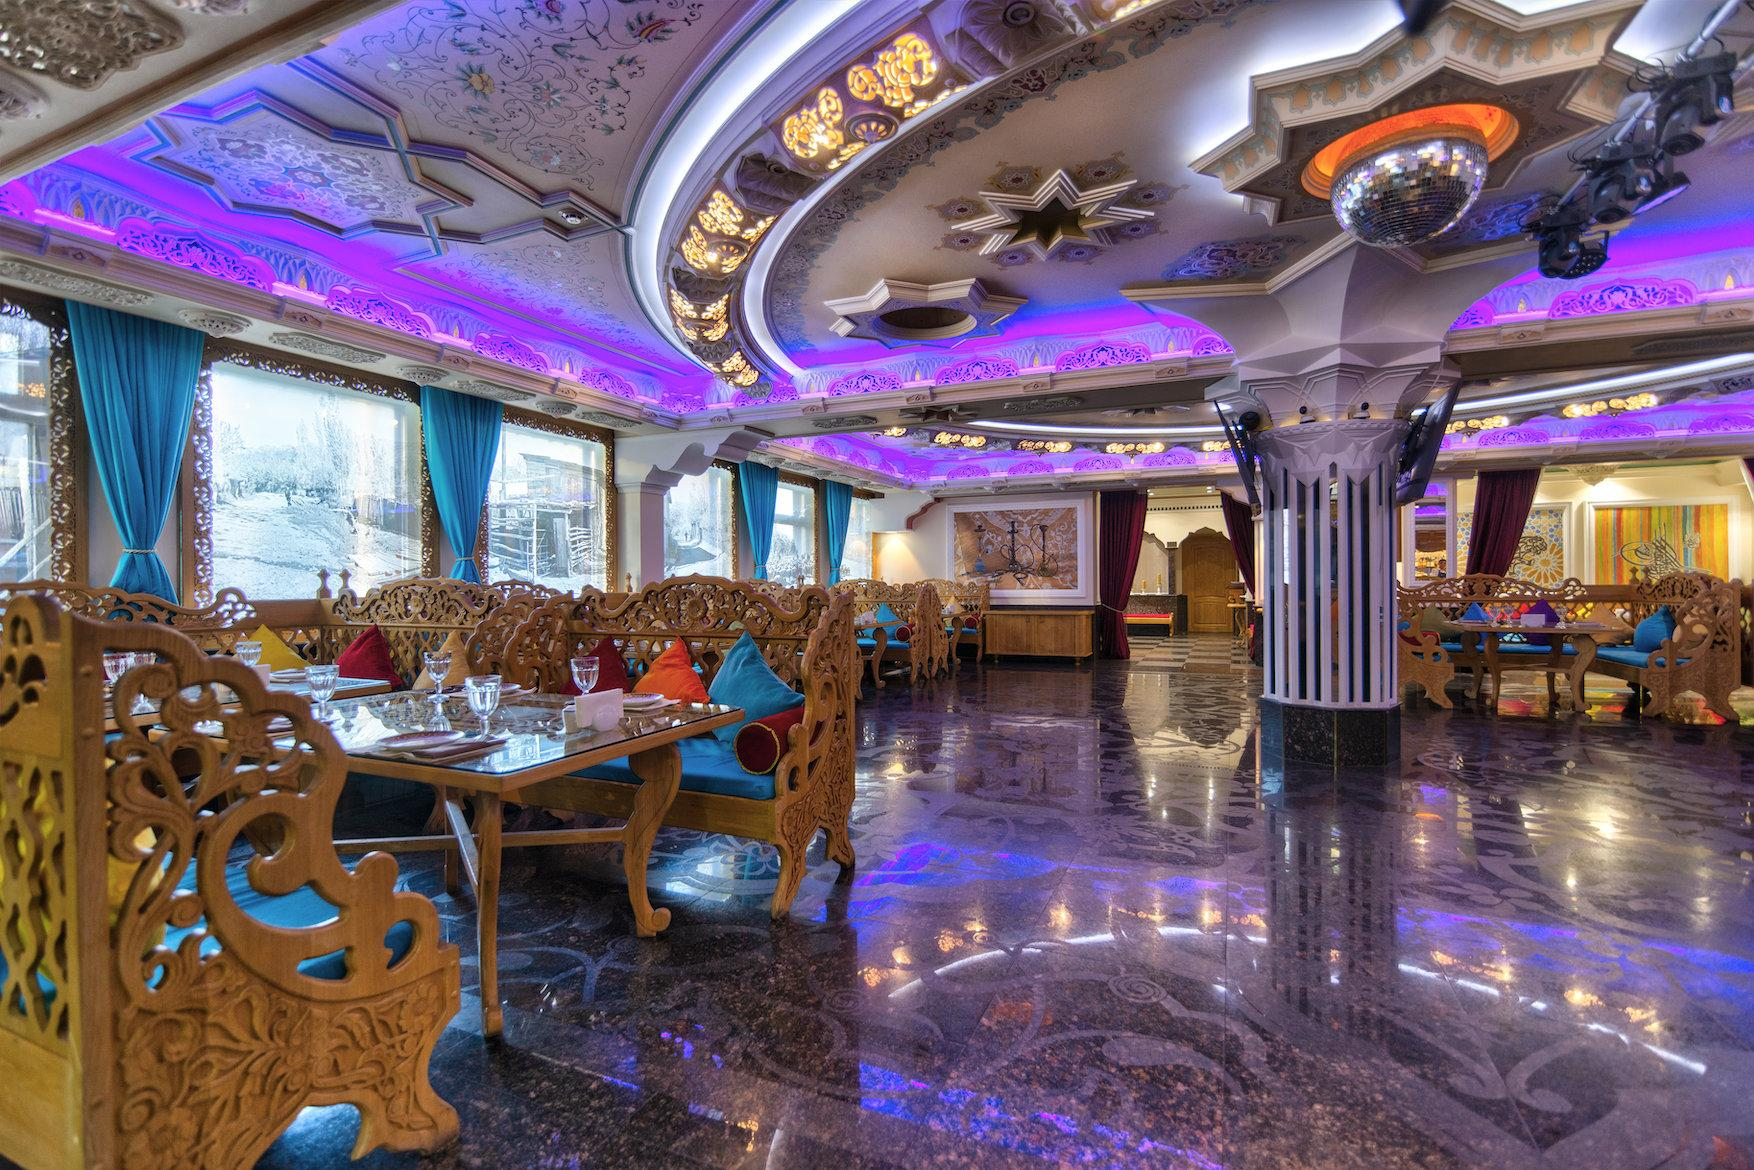 фотография Ресторана-караоке Будур на Нижегородской улице